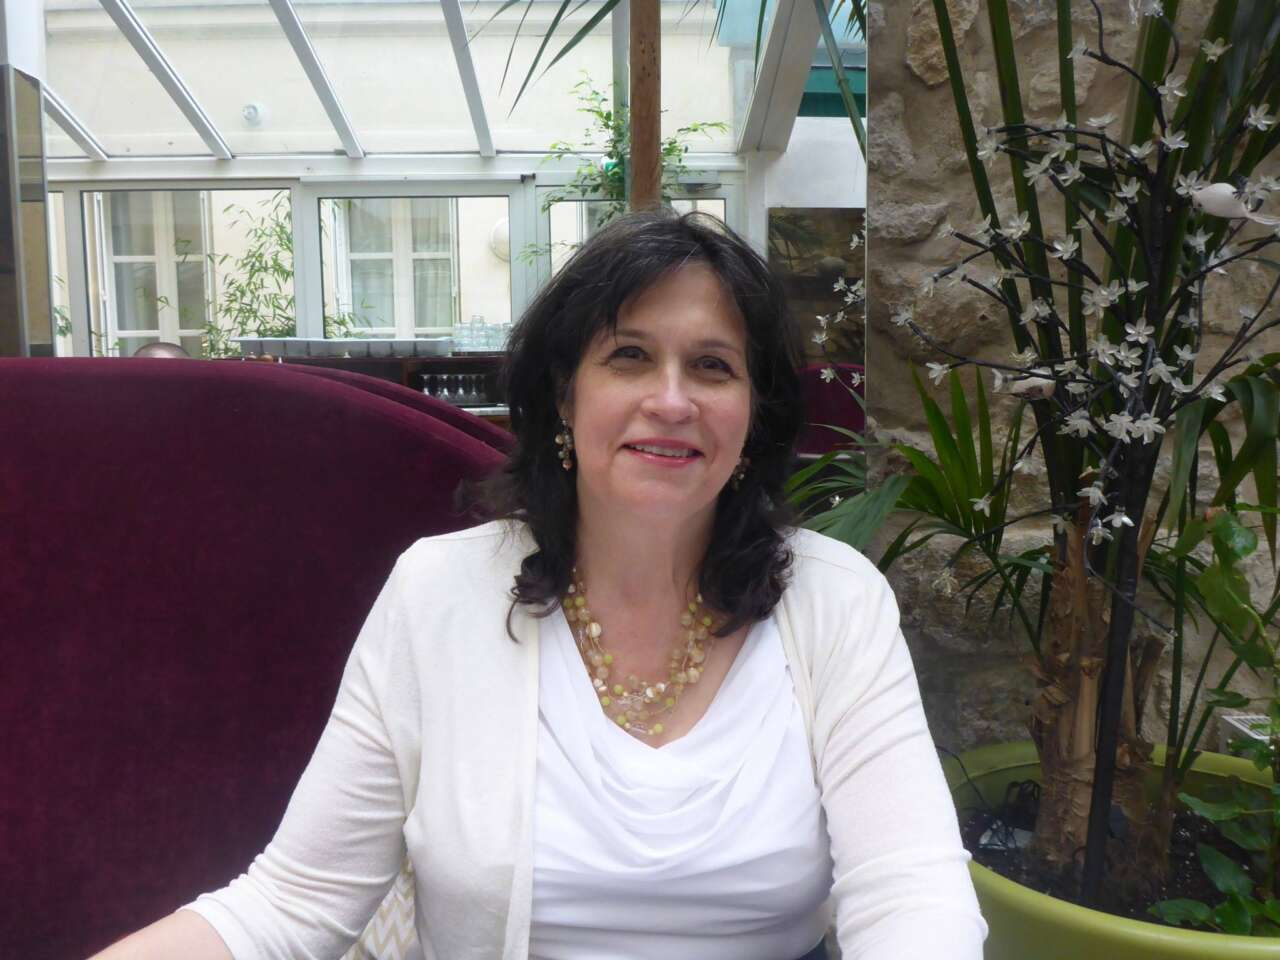 Kathy Bader older sister Diedrich Bader